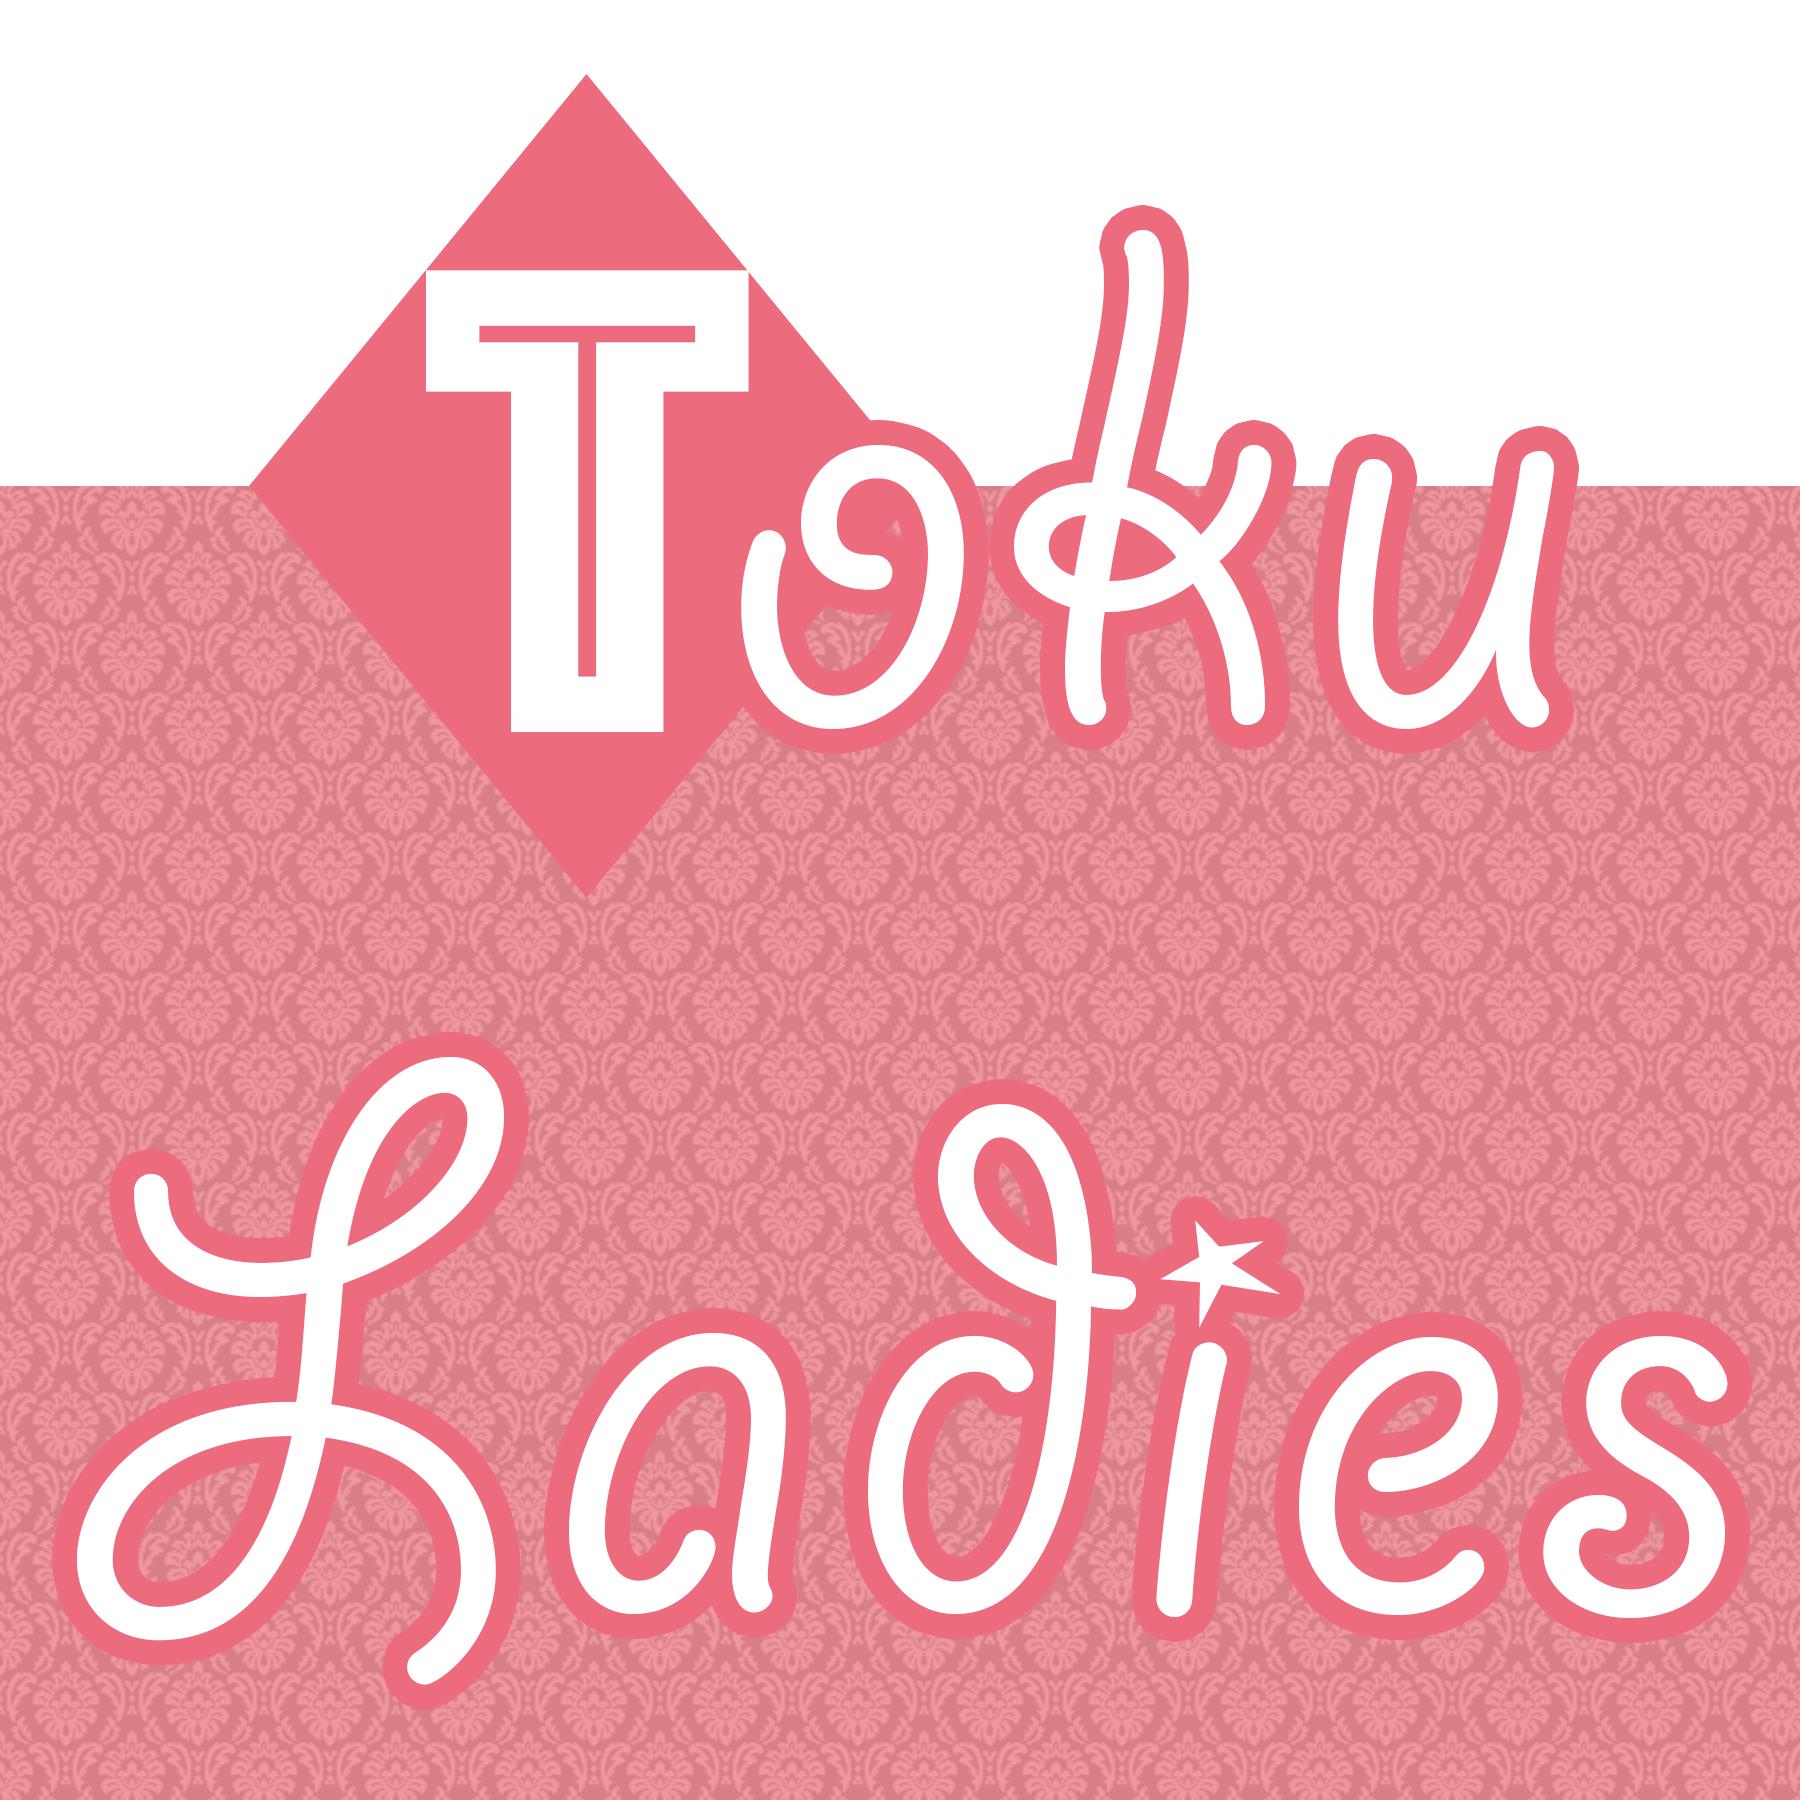 tokuladiespodcast's podcast show art